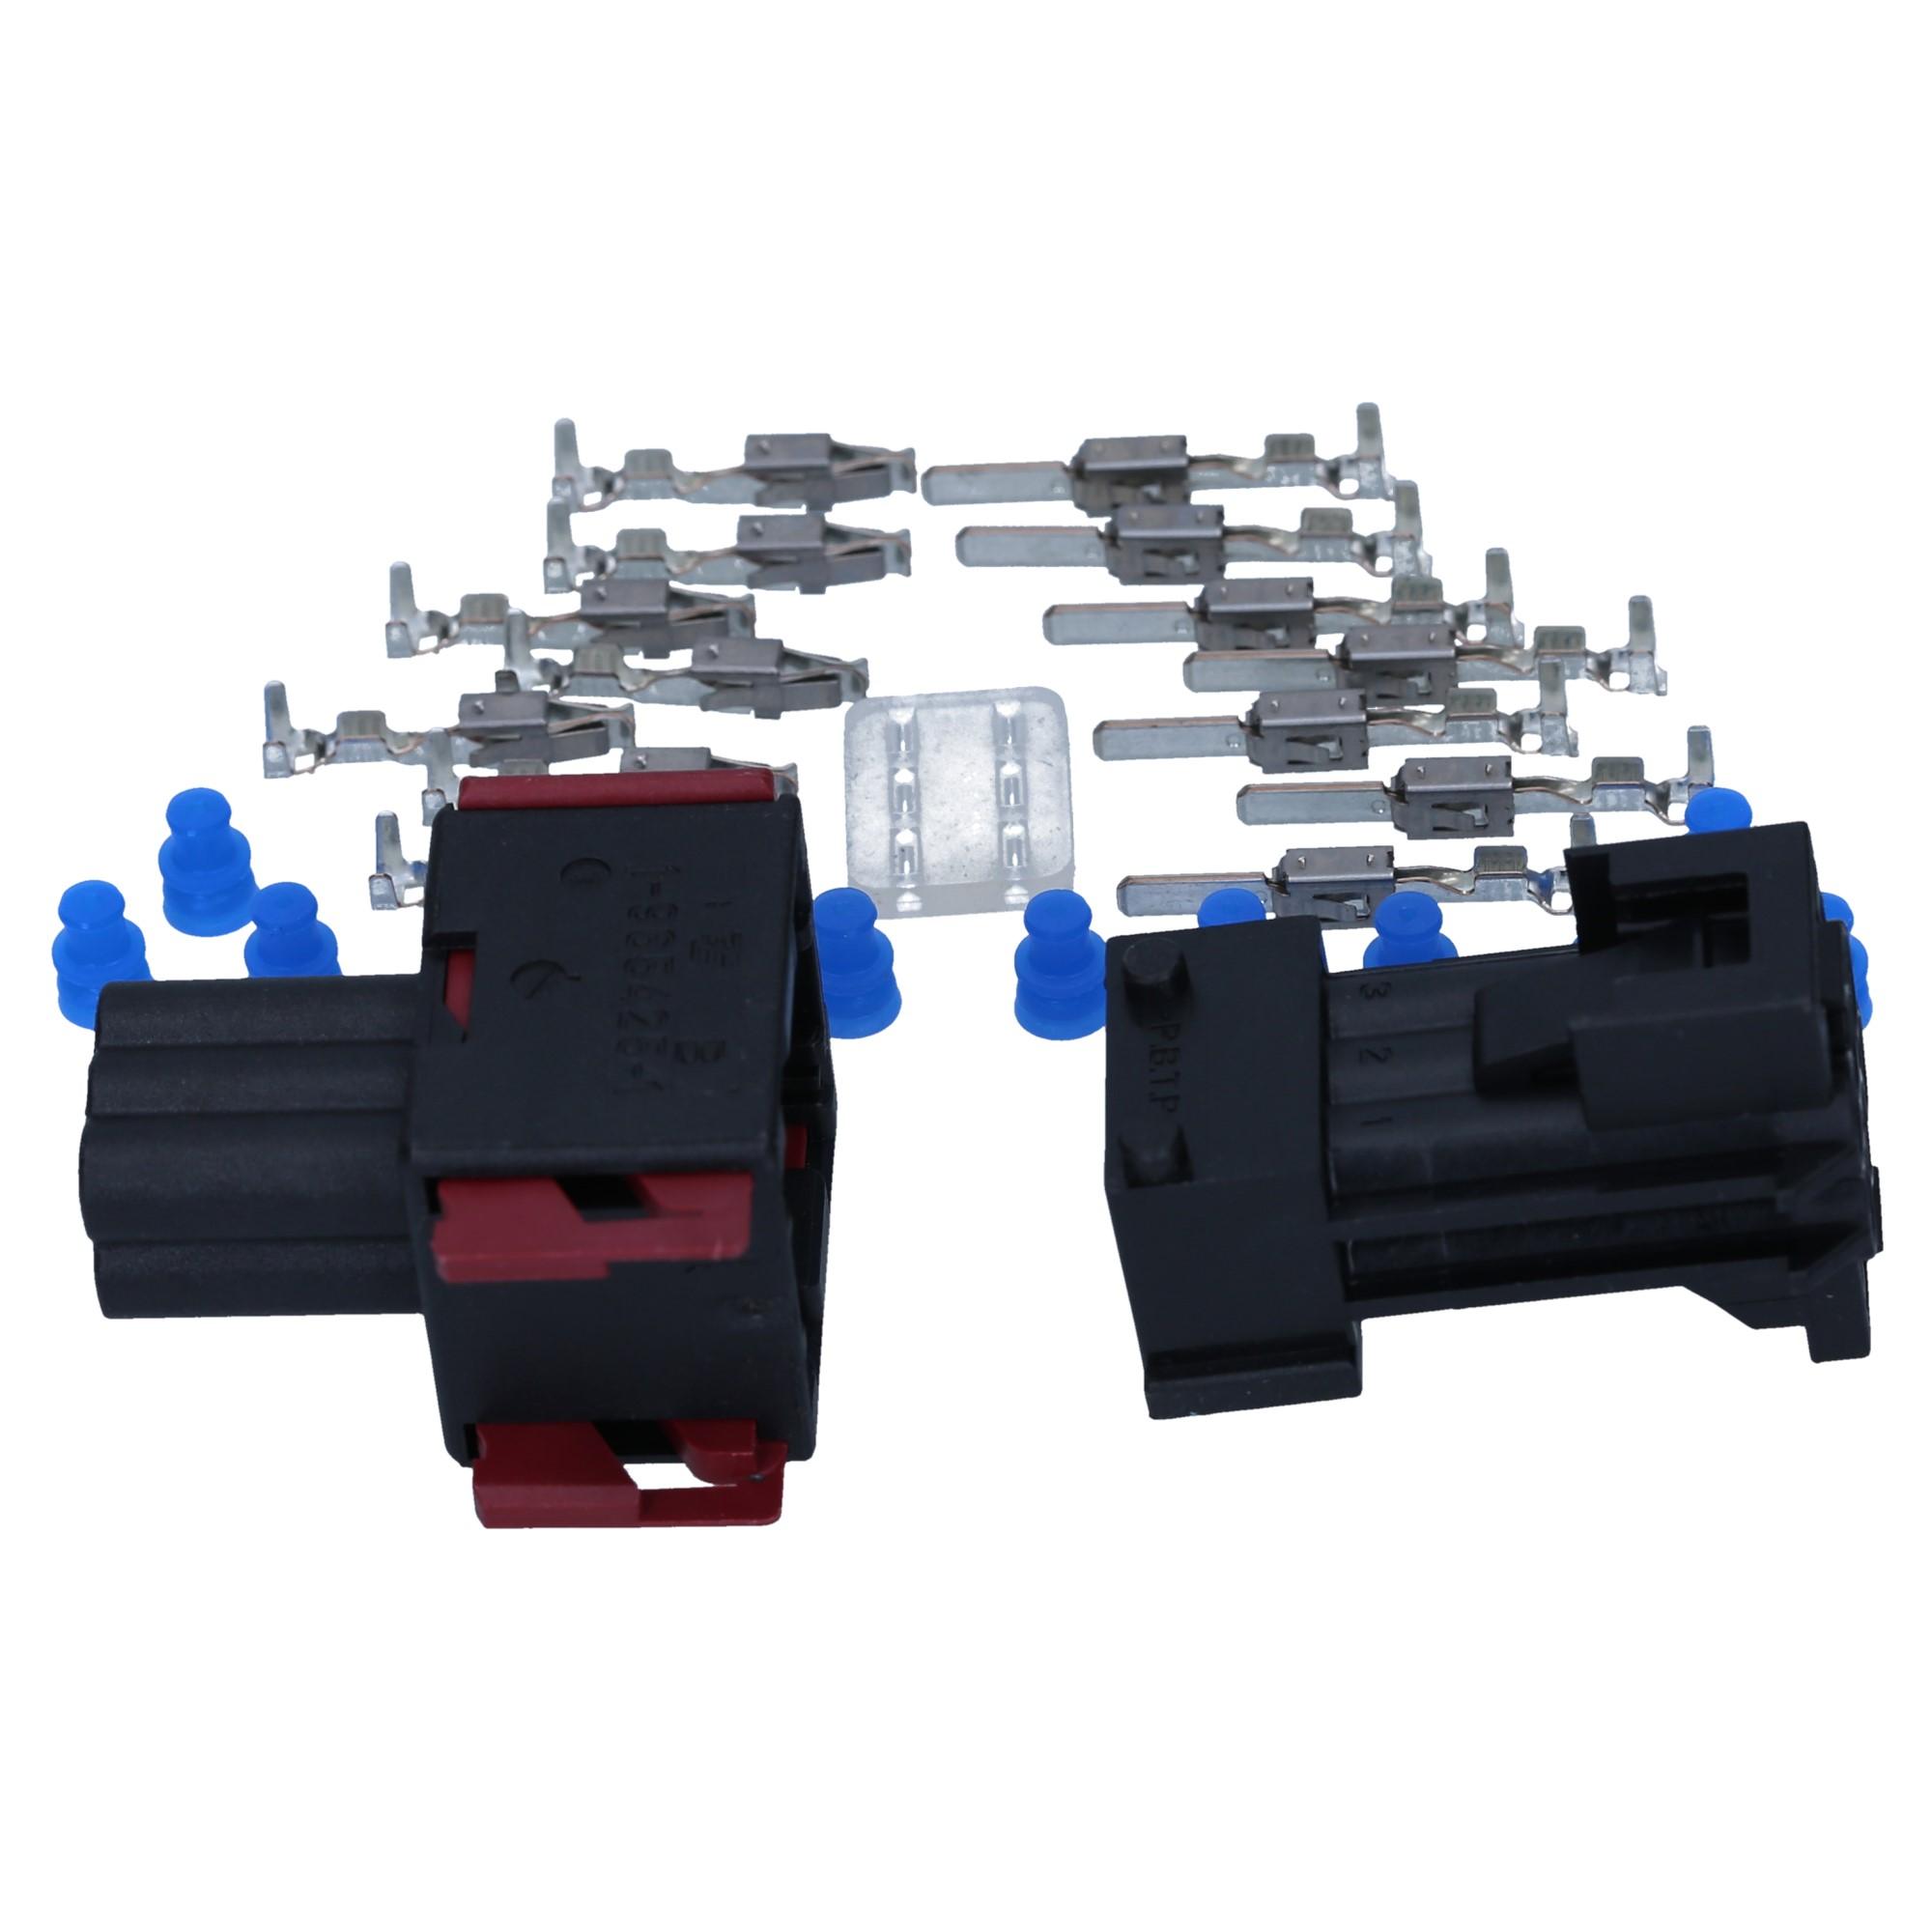 KALI-1306 AMP JPT Set 6-polig 0,5-1,0mm² Reperatursatz Stecker Satz Kfz Auto